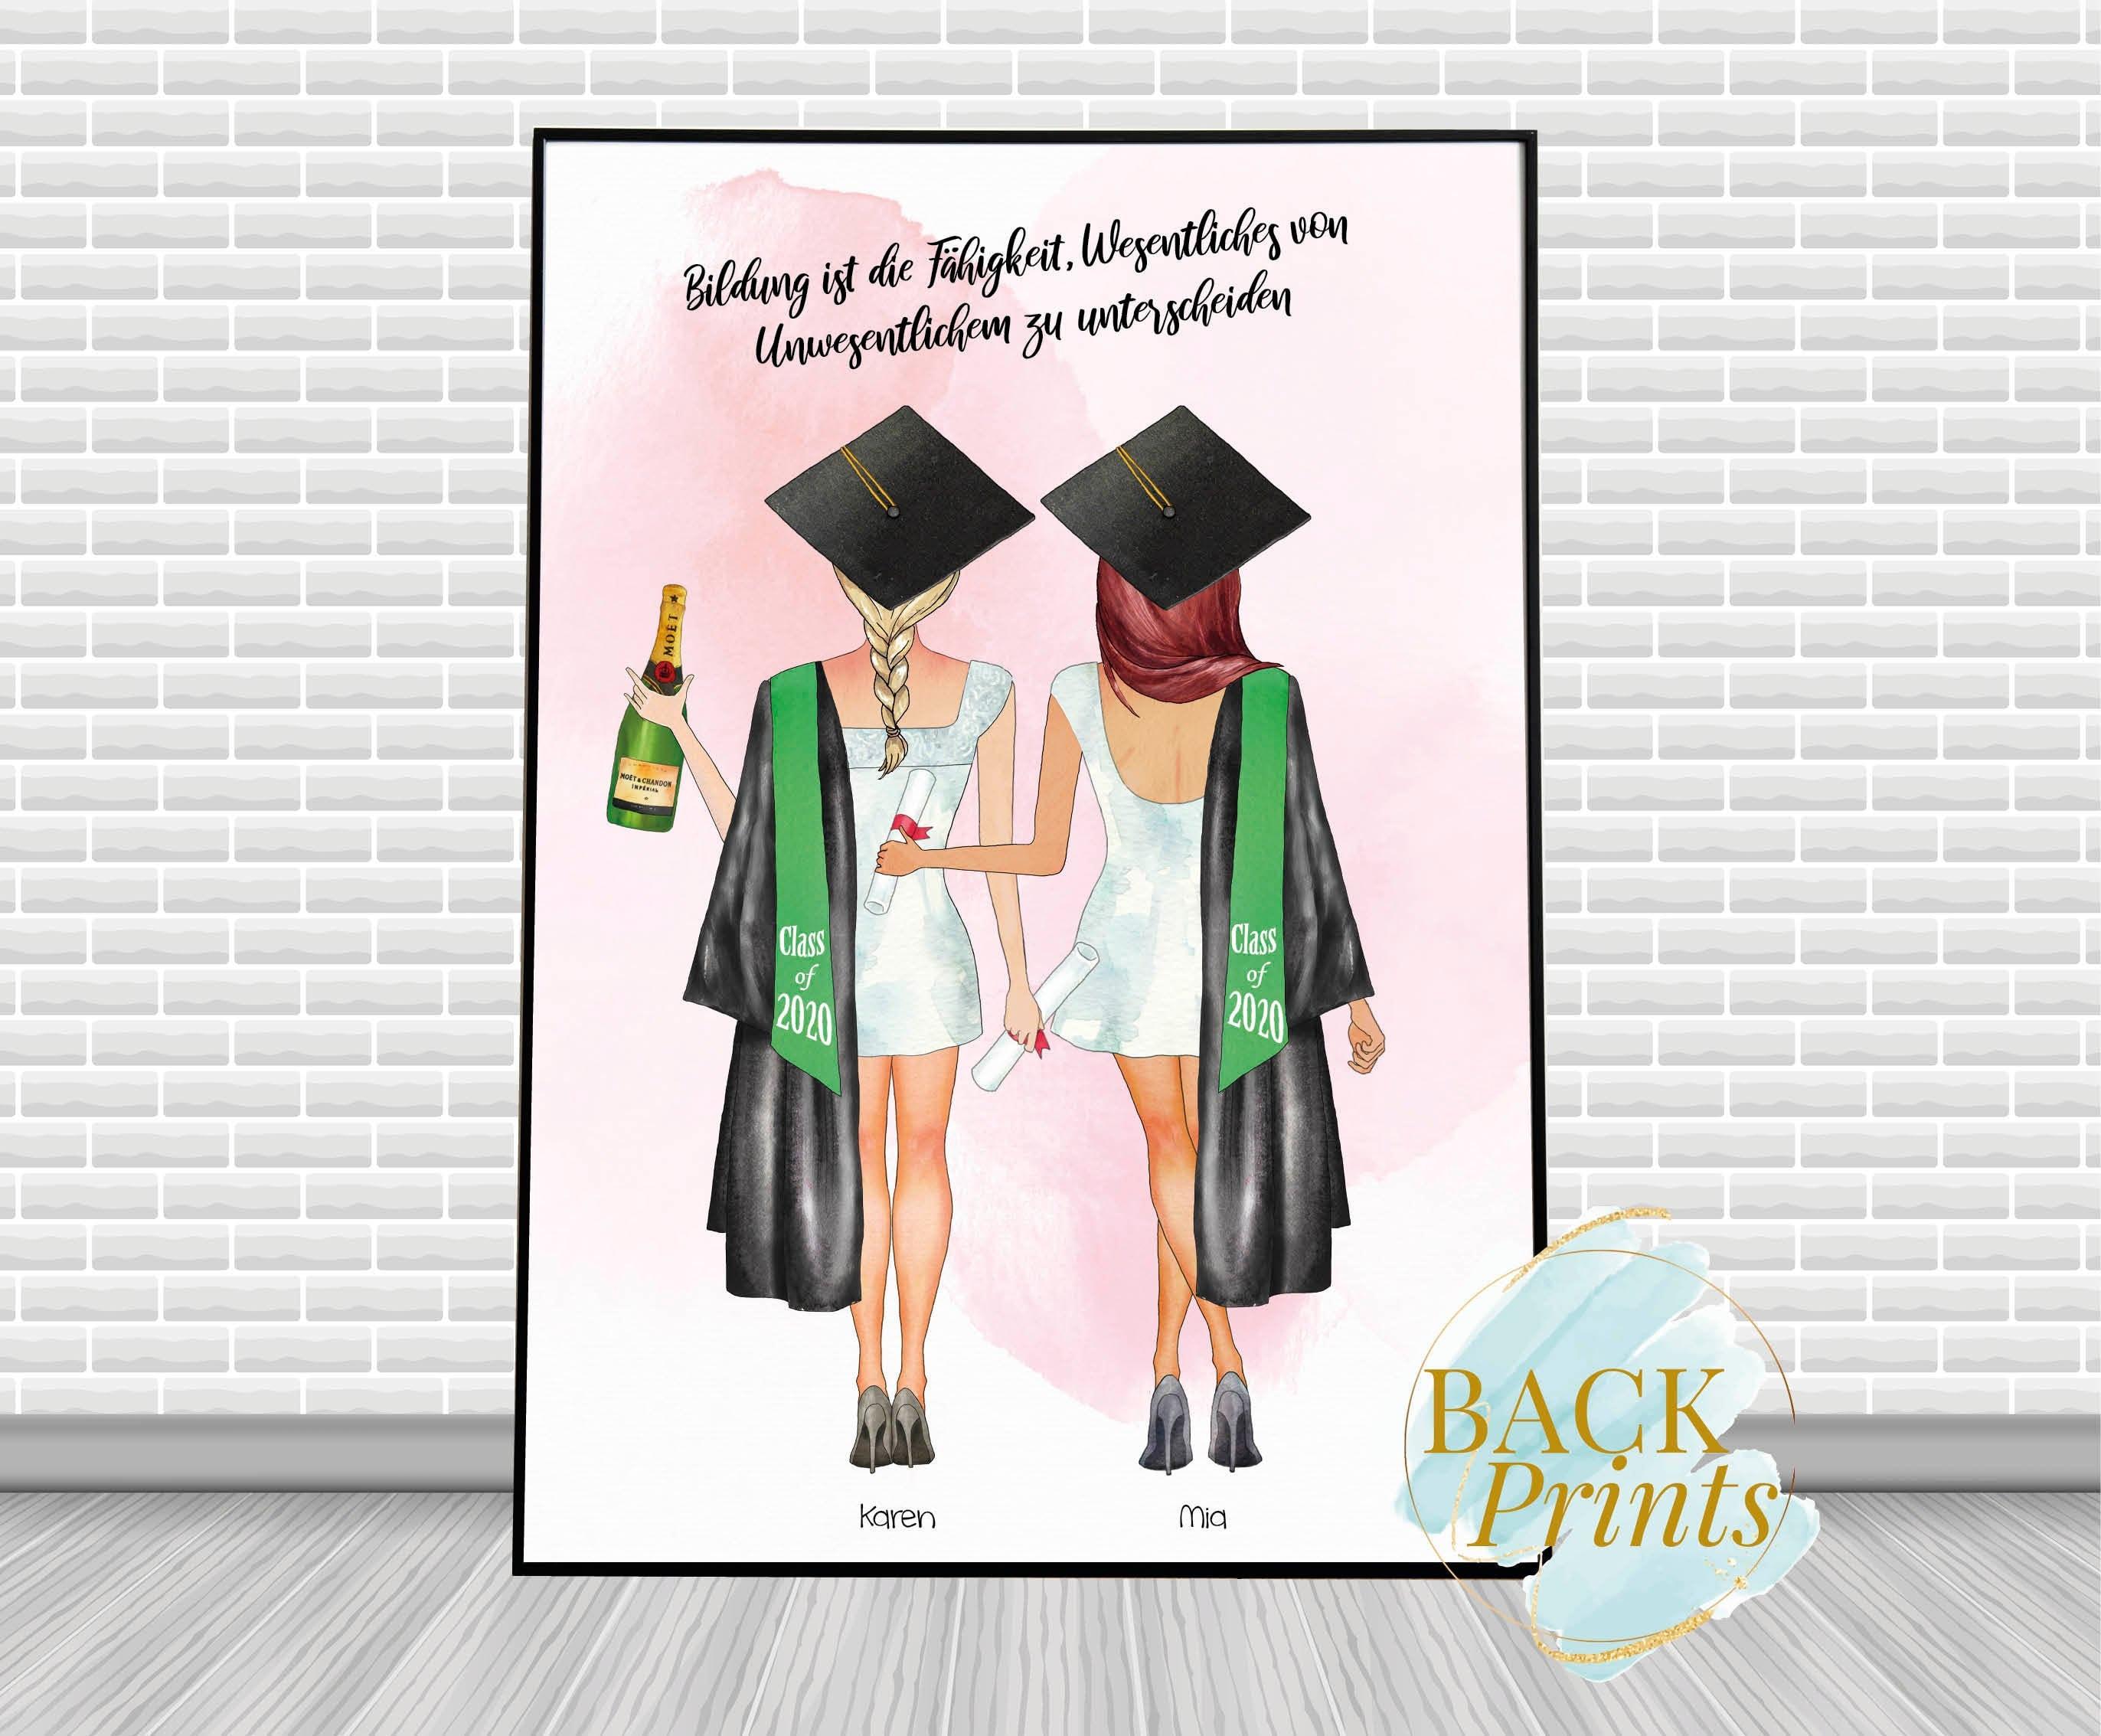 Custom Personalized Graduation Print Gift for her Best Friend BFF Friend Girlfriend High School College Class of 2020 print 8x10